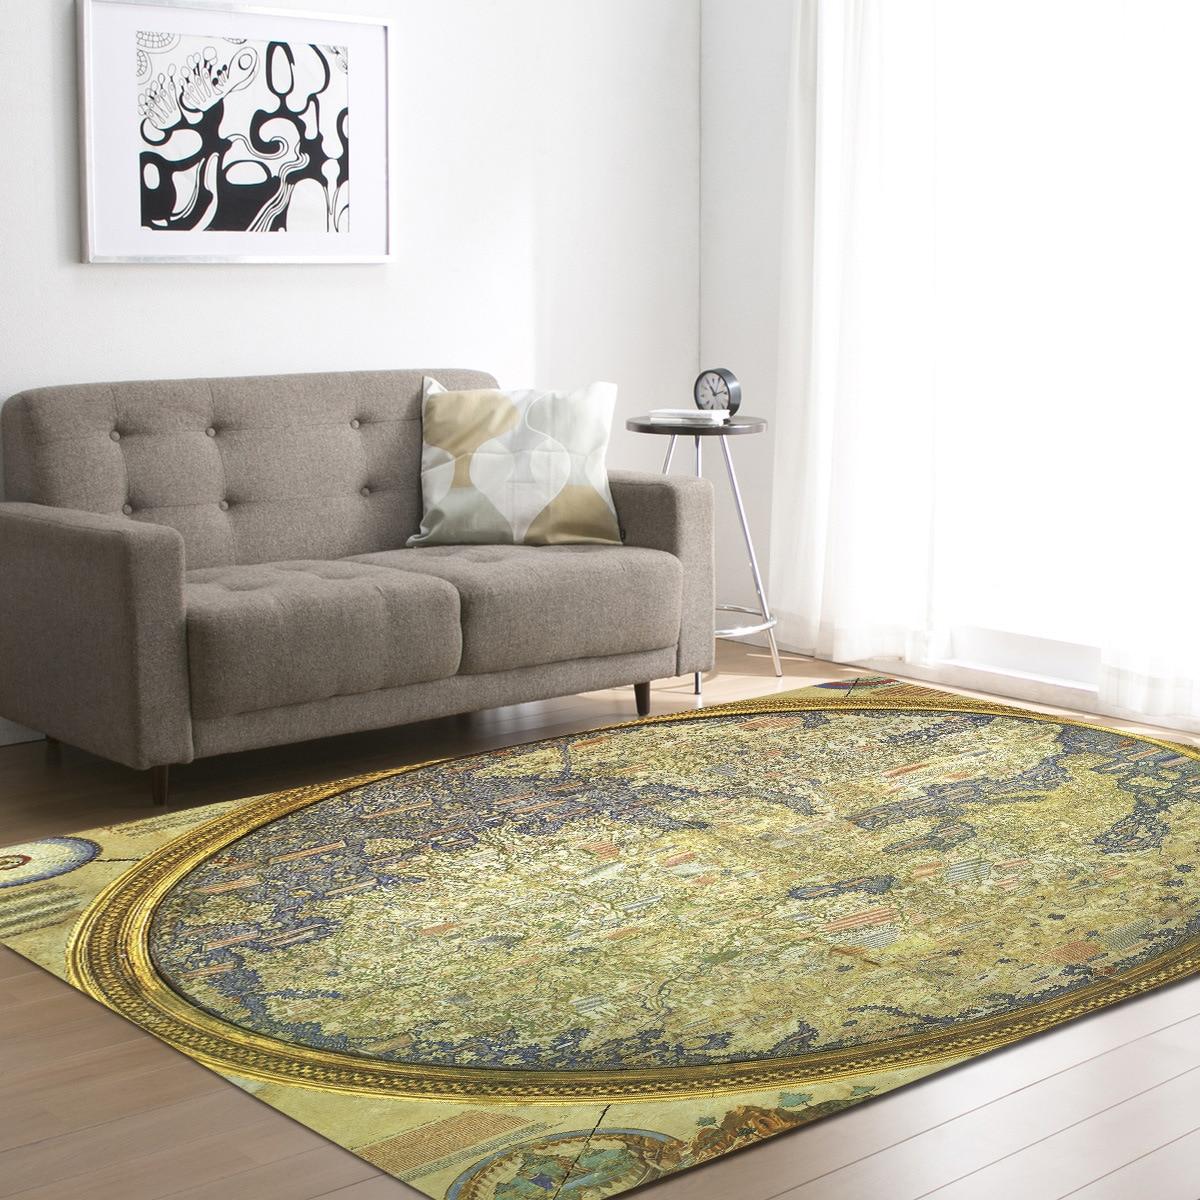 World Map Floor Mat Carpets For Living Room Anti-slip Office Chair Rugs Bedroom Carpets Kids Study Room Bedside Area Rug